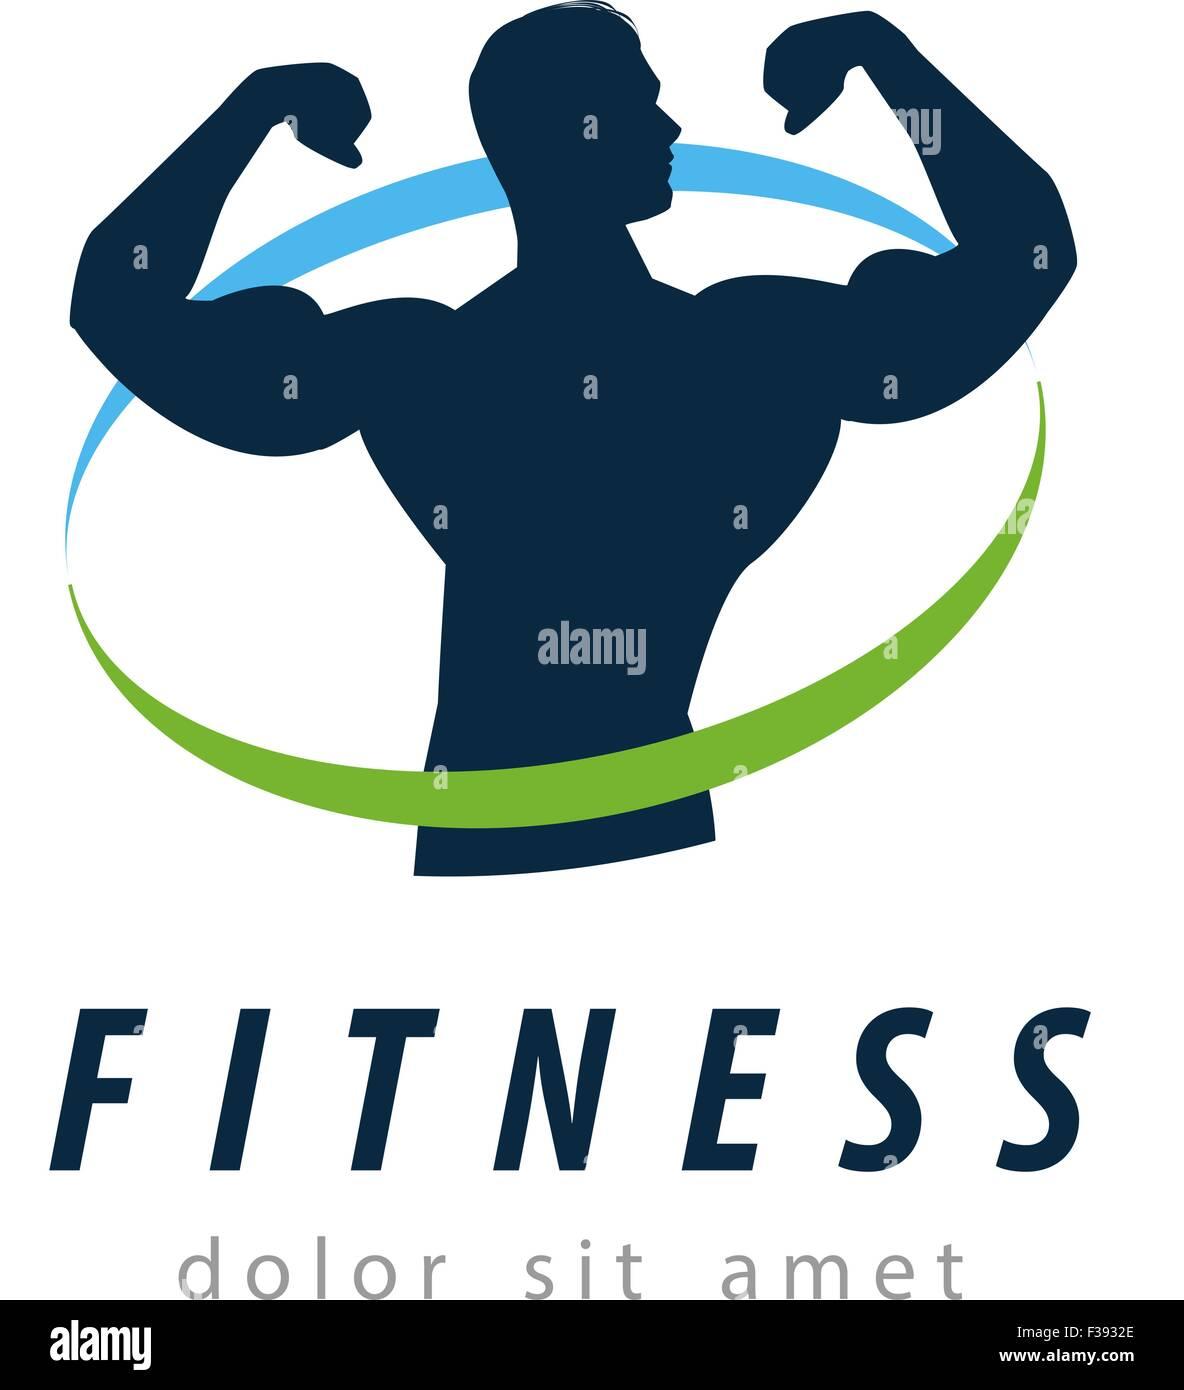 fitness-vector-logo-design-template-heal